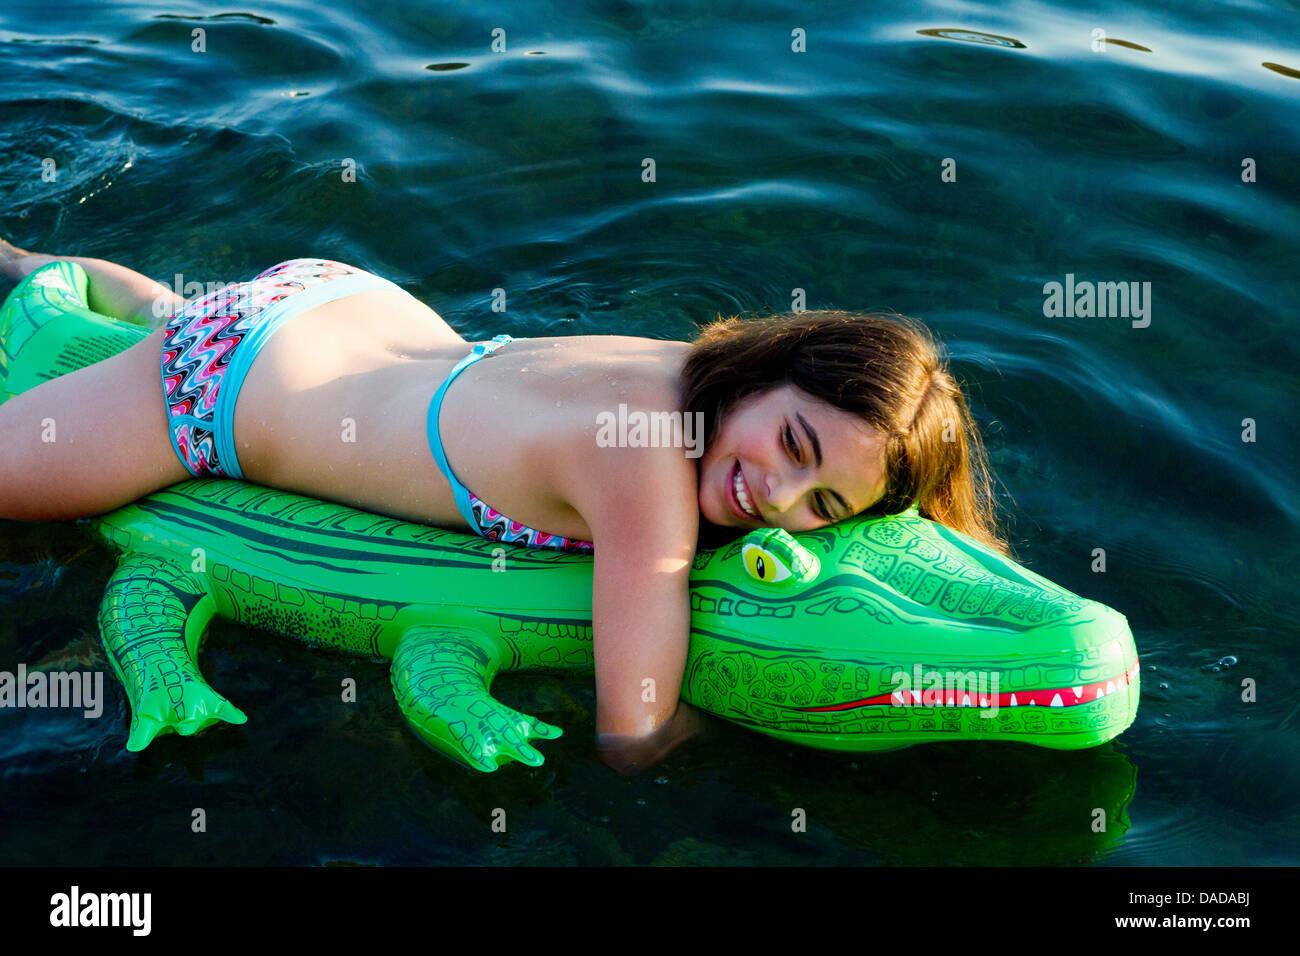 Girl in sea with inflatable crocodile - Stock Image